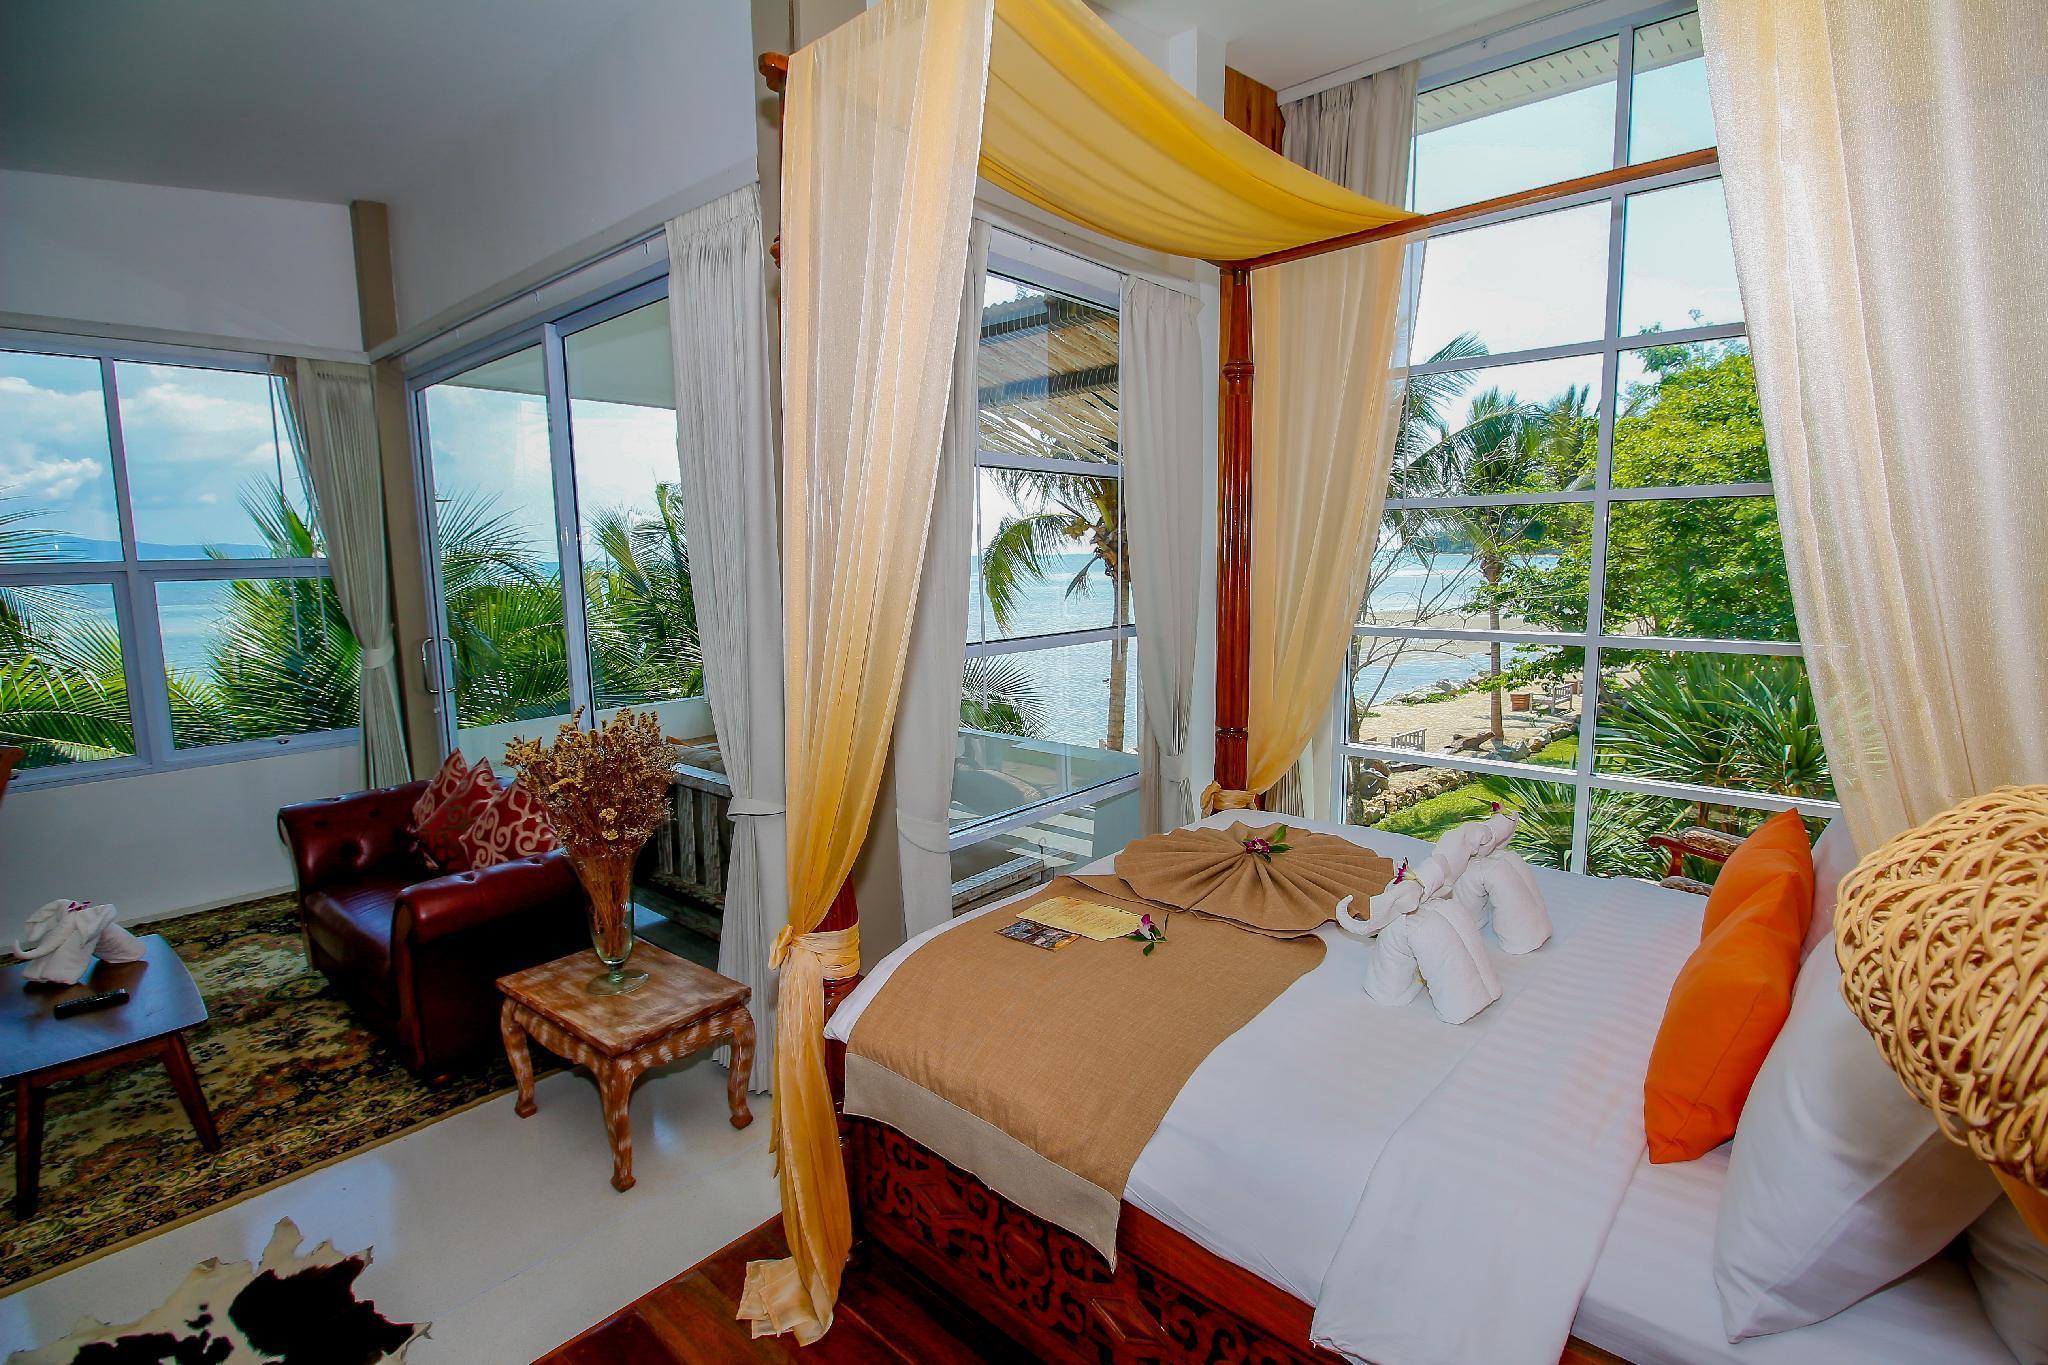 Summer Luxury Beach Resort & Spa ซัมเมอร์ ลักชัวรี บีช รีสอร์ต แอนด์ สปา